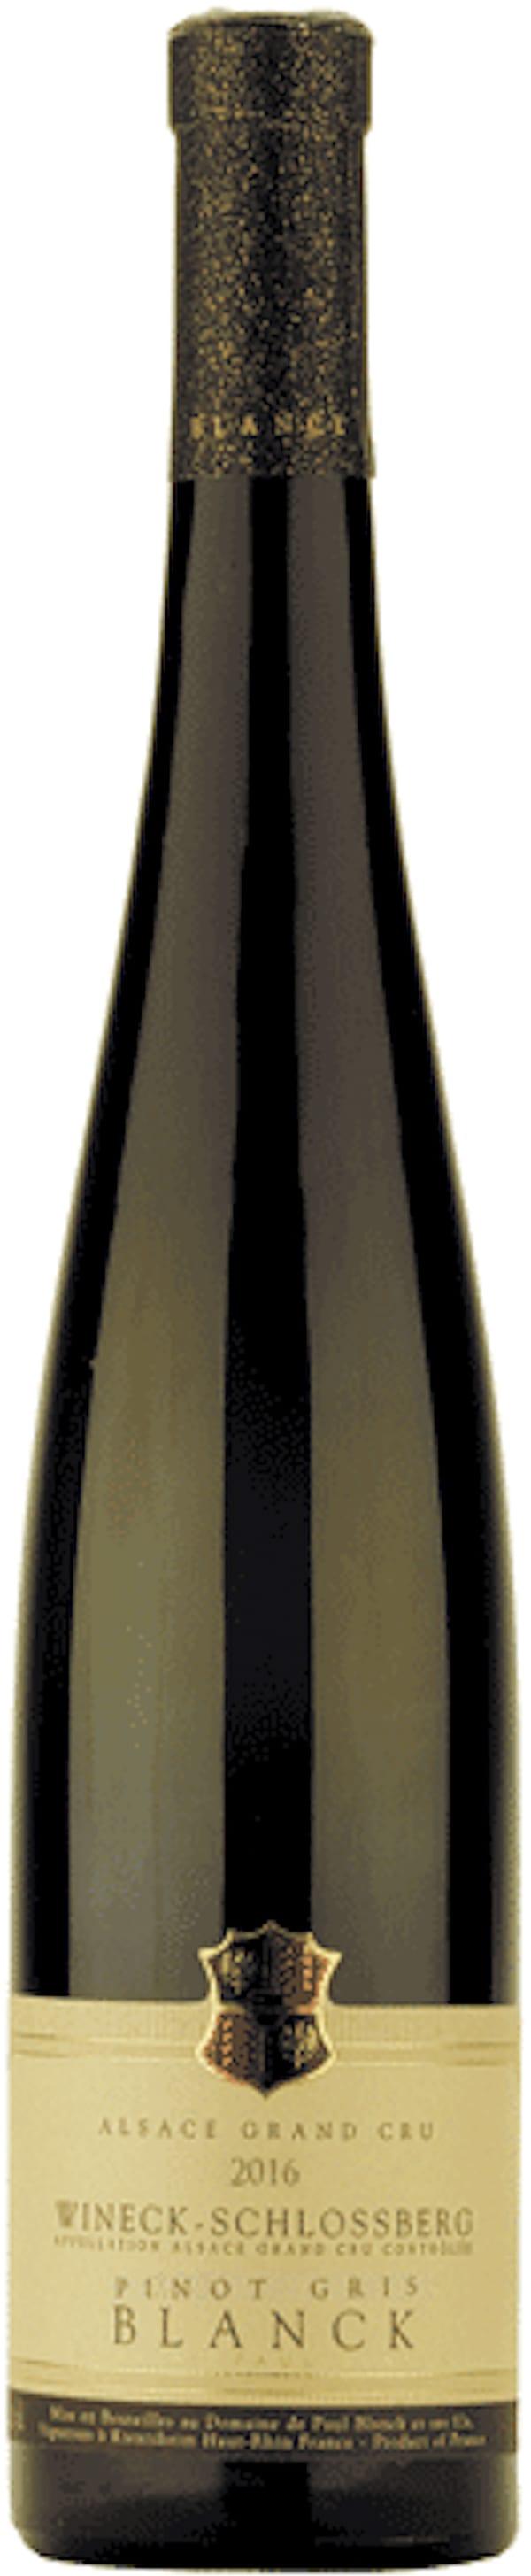 Paul Blanck Pinot Gris Wineck-Schlossberg Grand Cru 2016